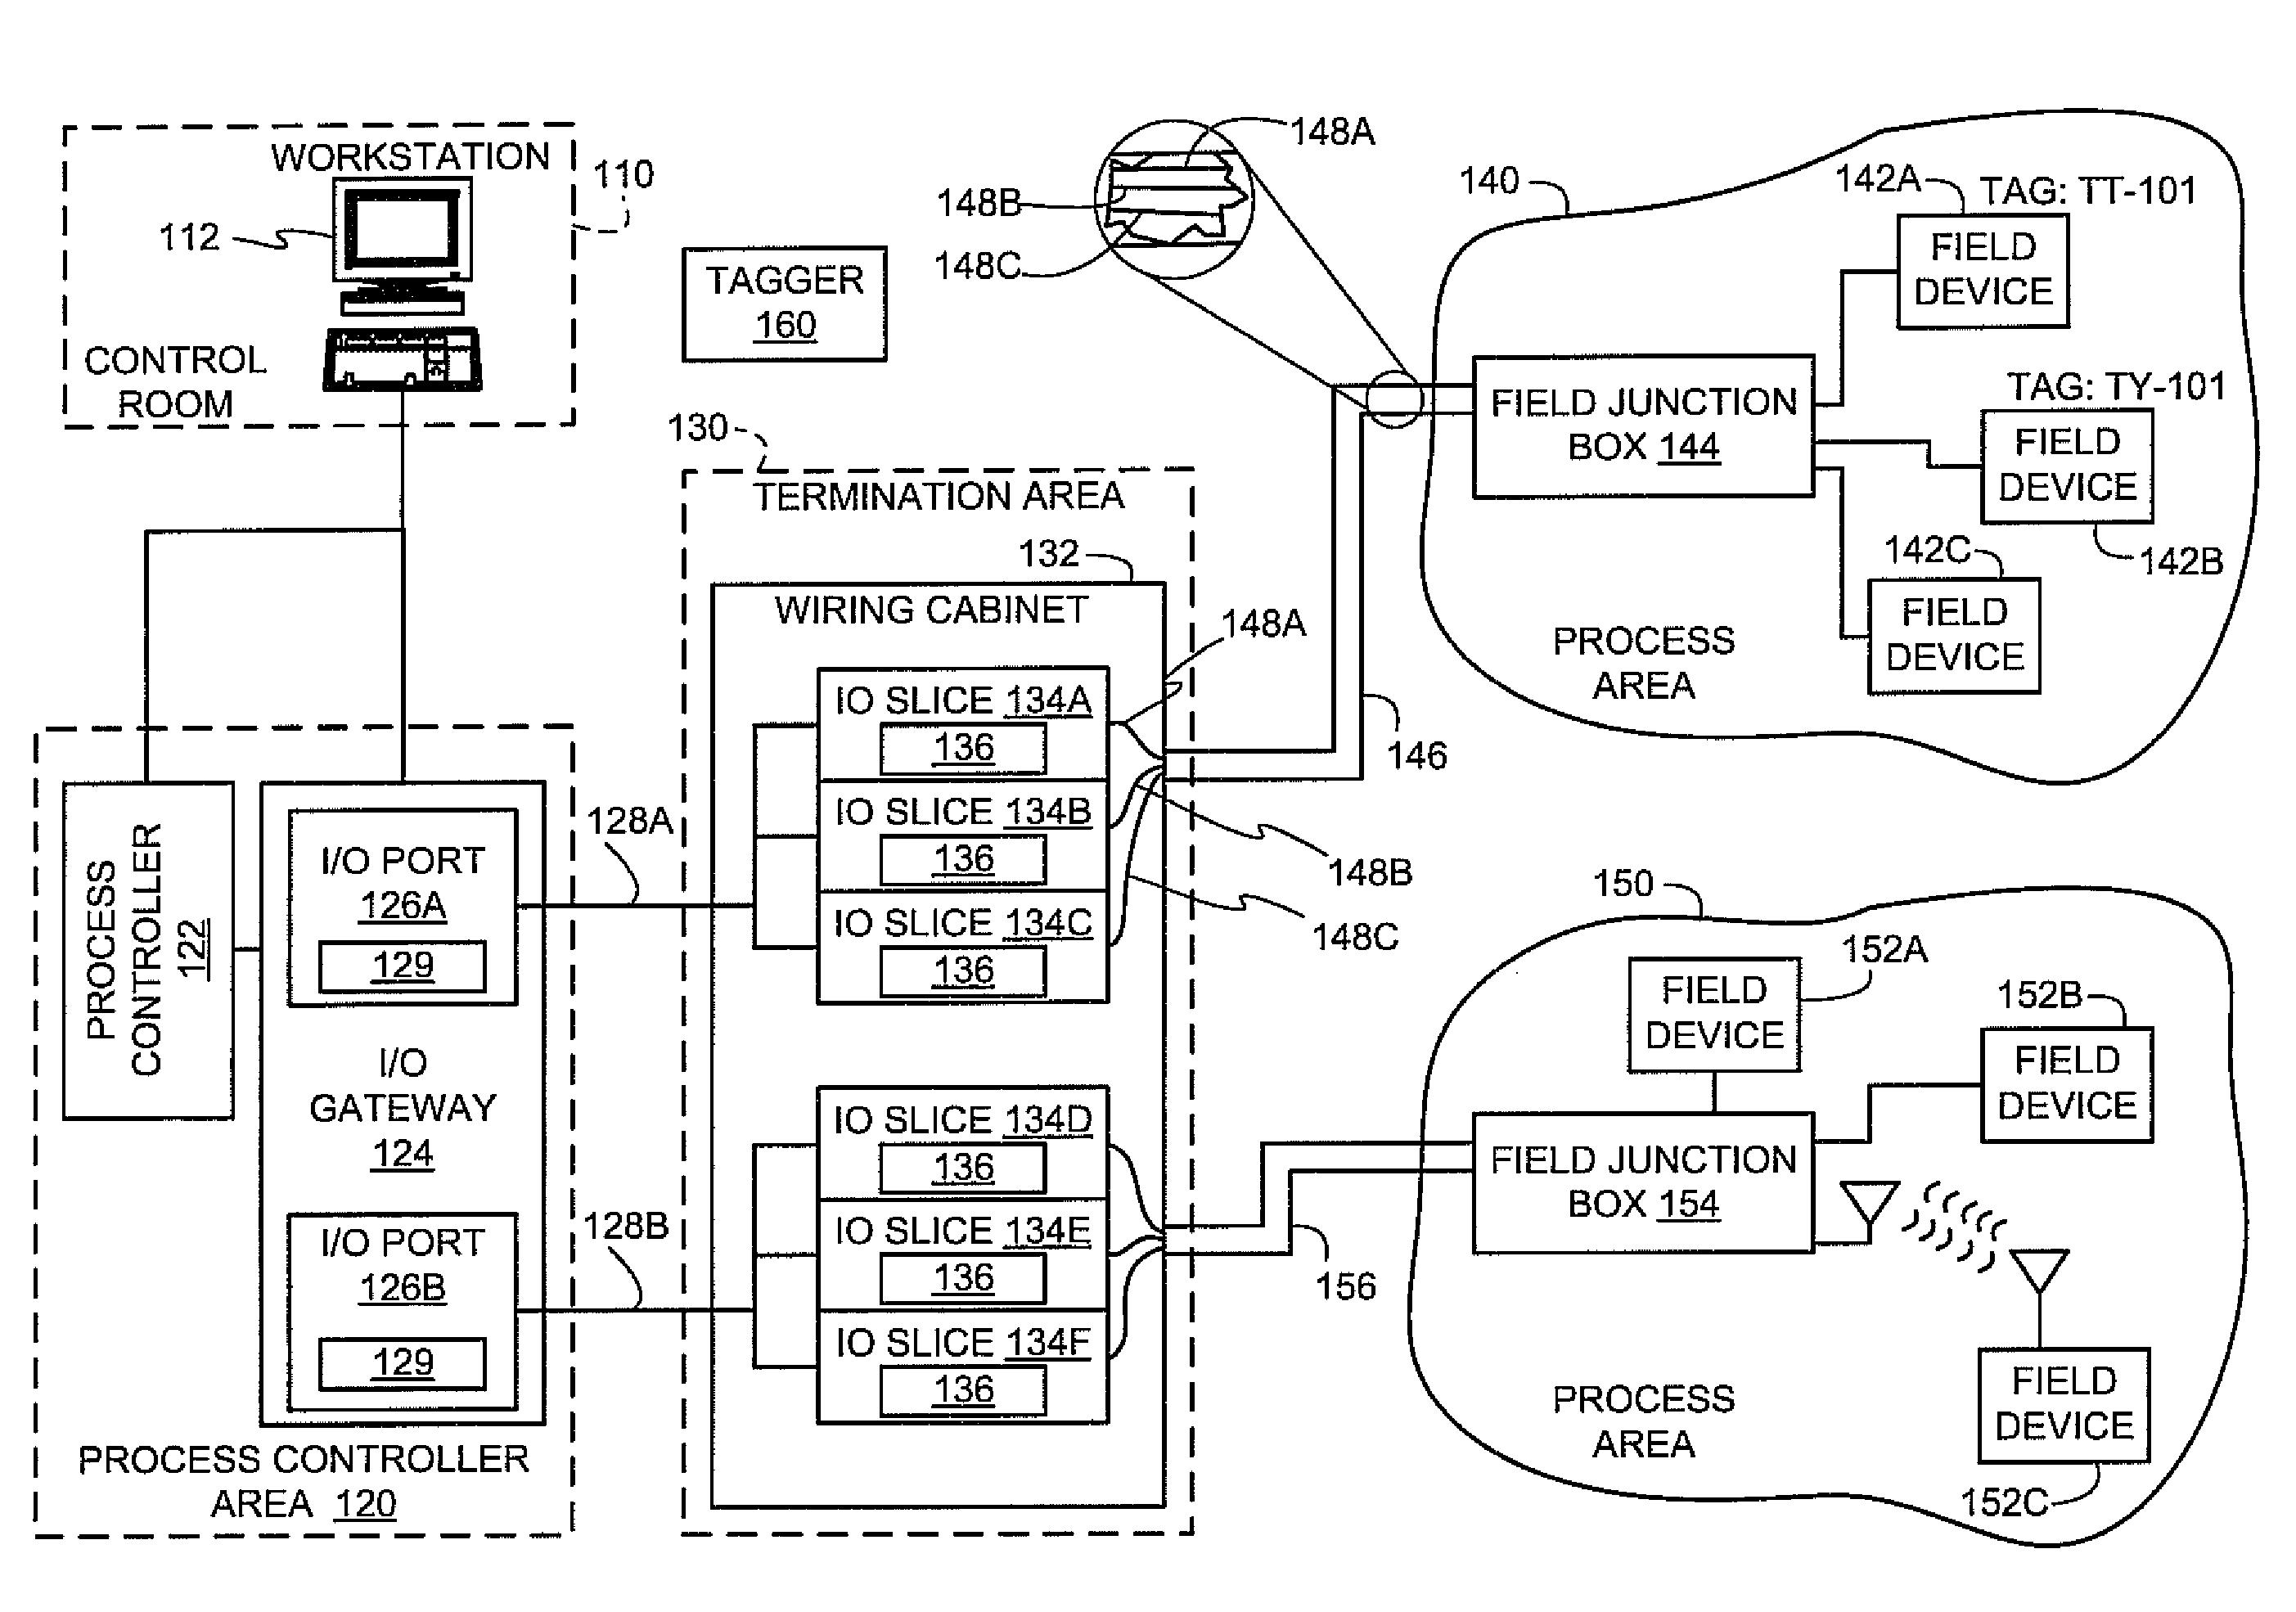 rosemount wiring diagram barrett wiring diagram wiring